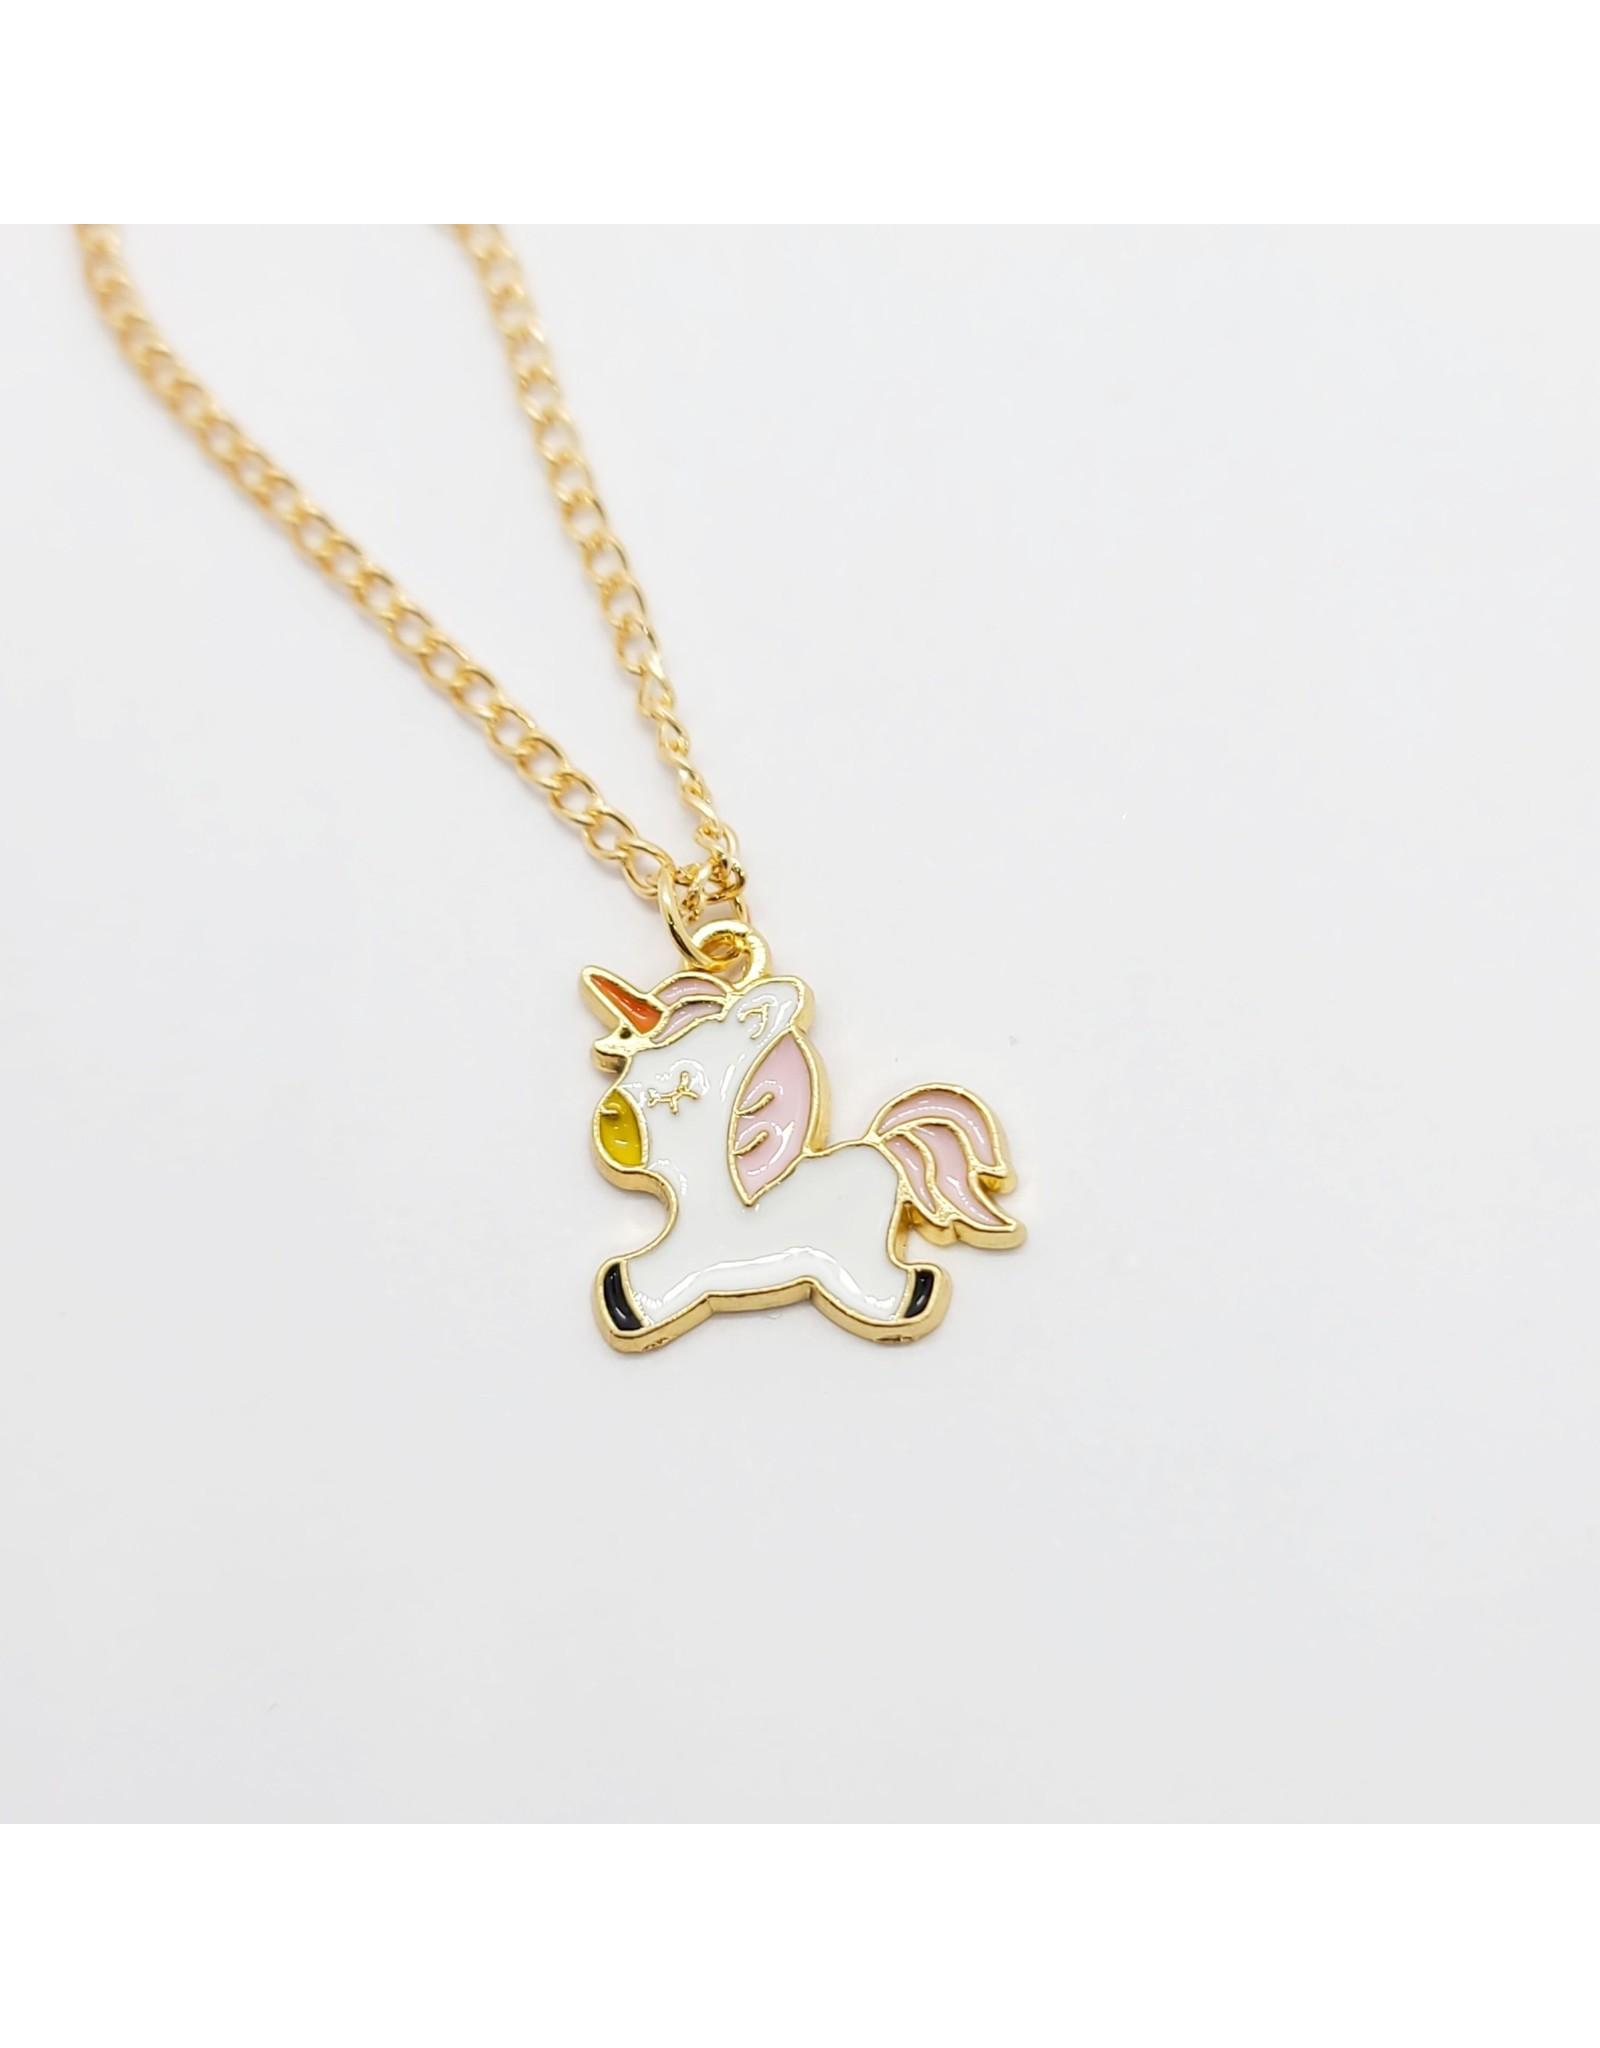 Rainbow Unicorn Necklace